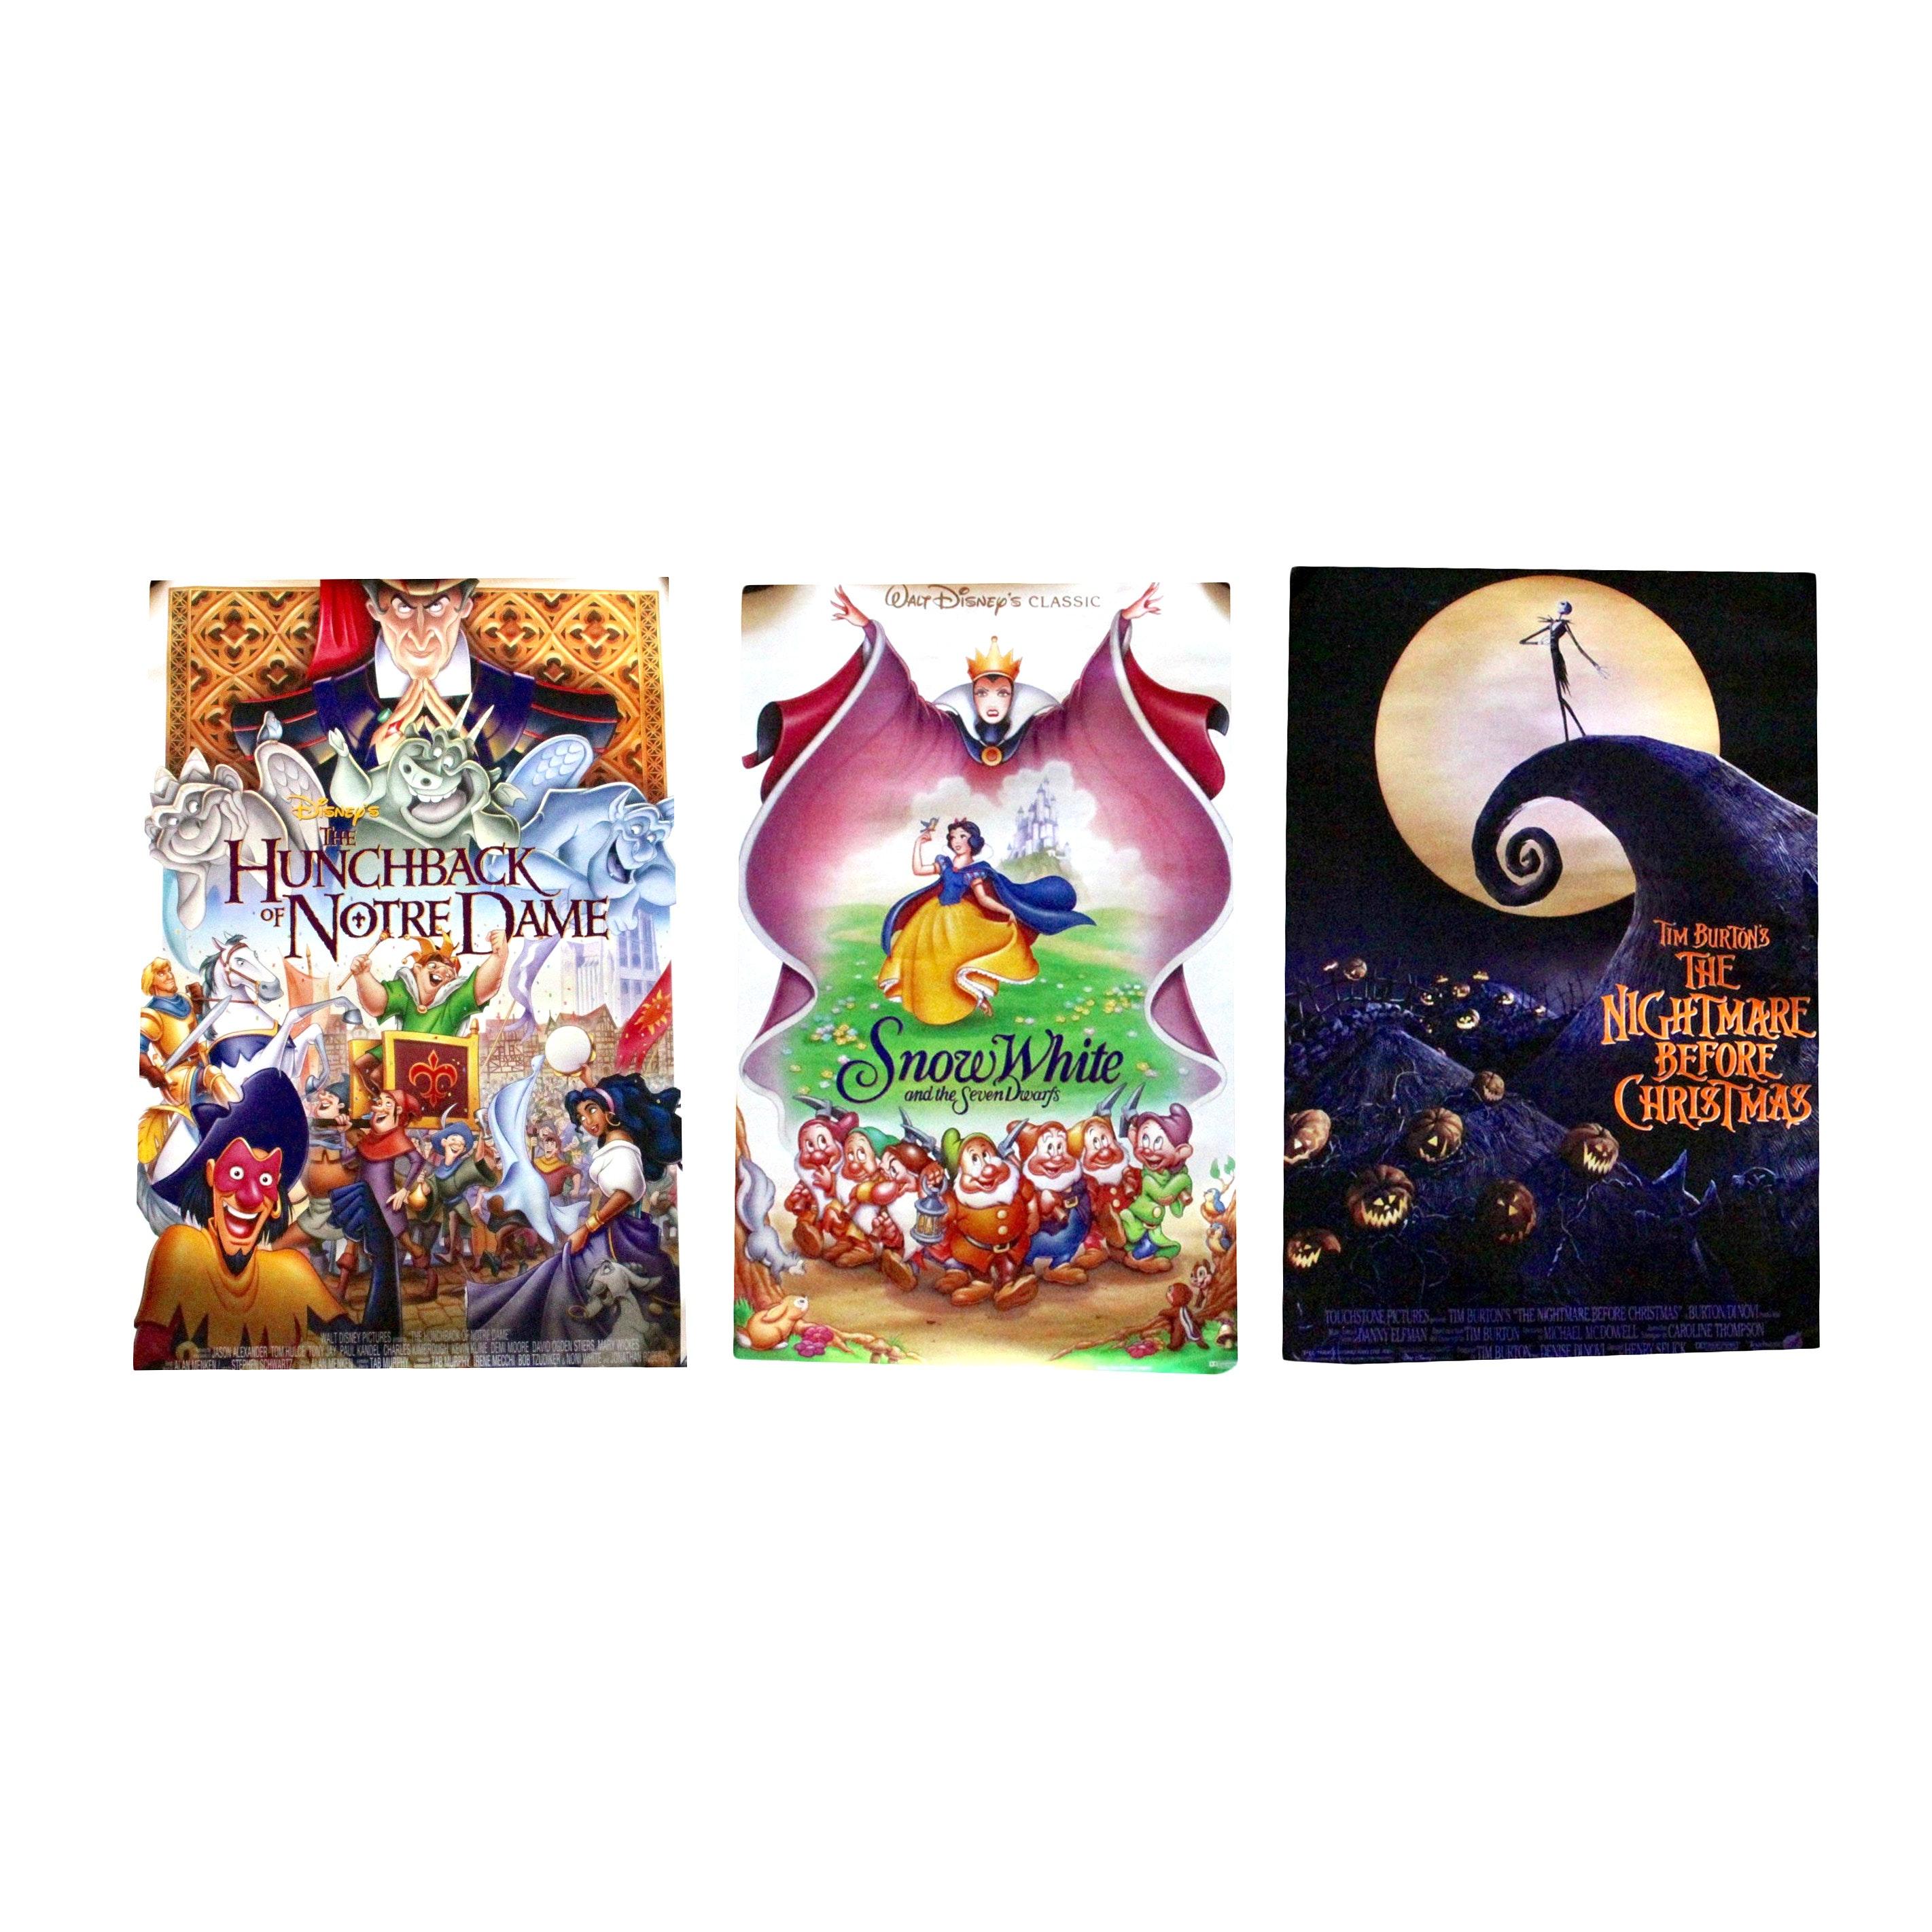 Assortment of Children's Movie Posters